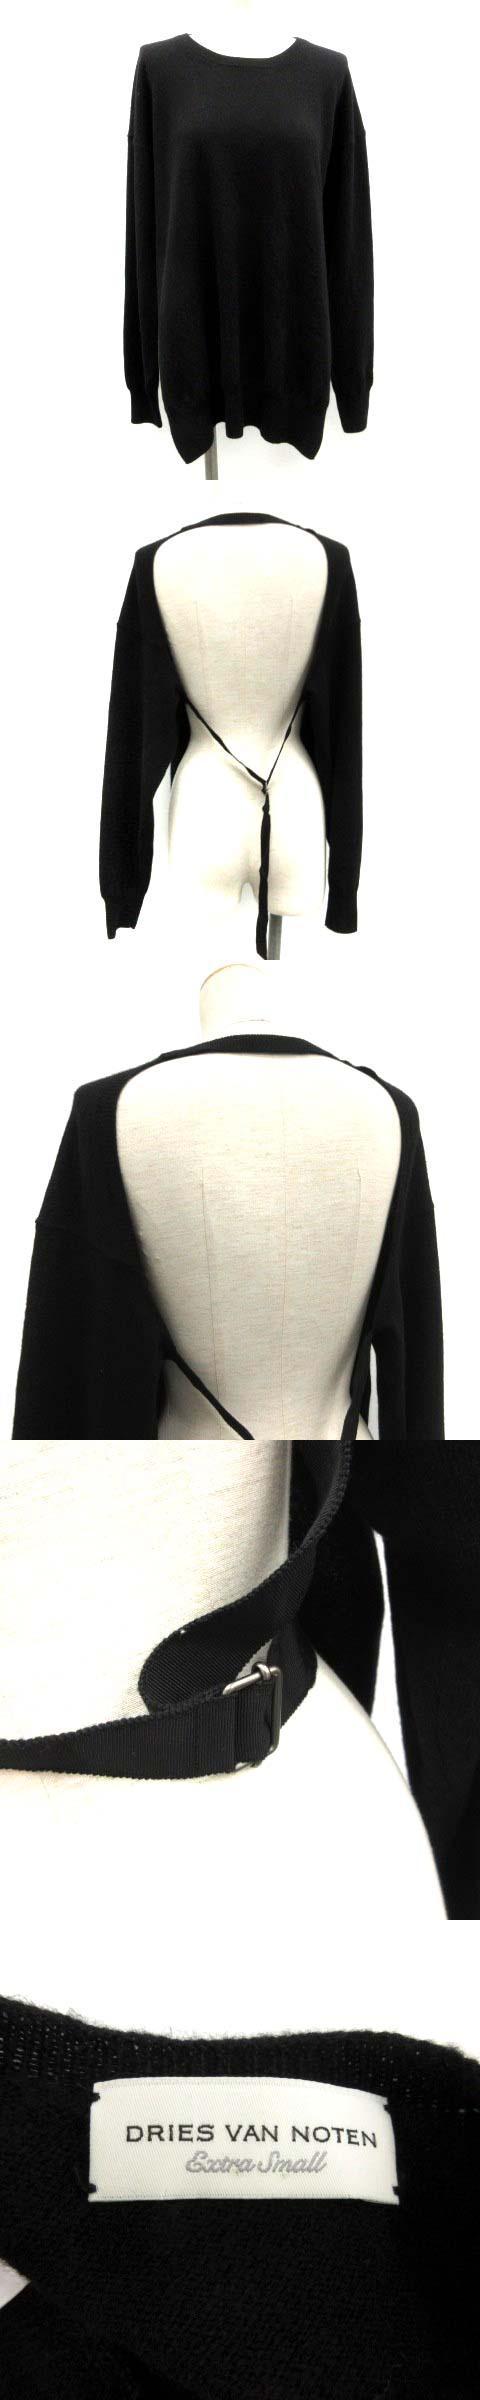 18SS デザインニット セーター 長袖 クルーネック XS 黒 ブラック /TK